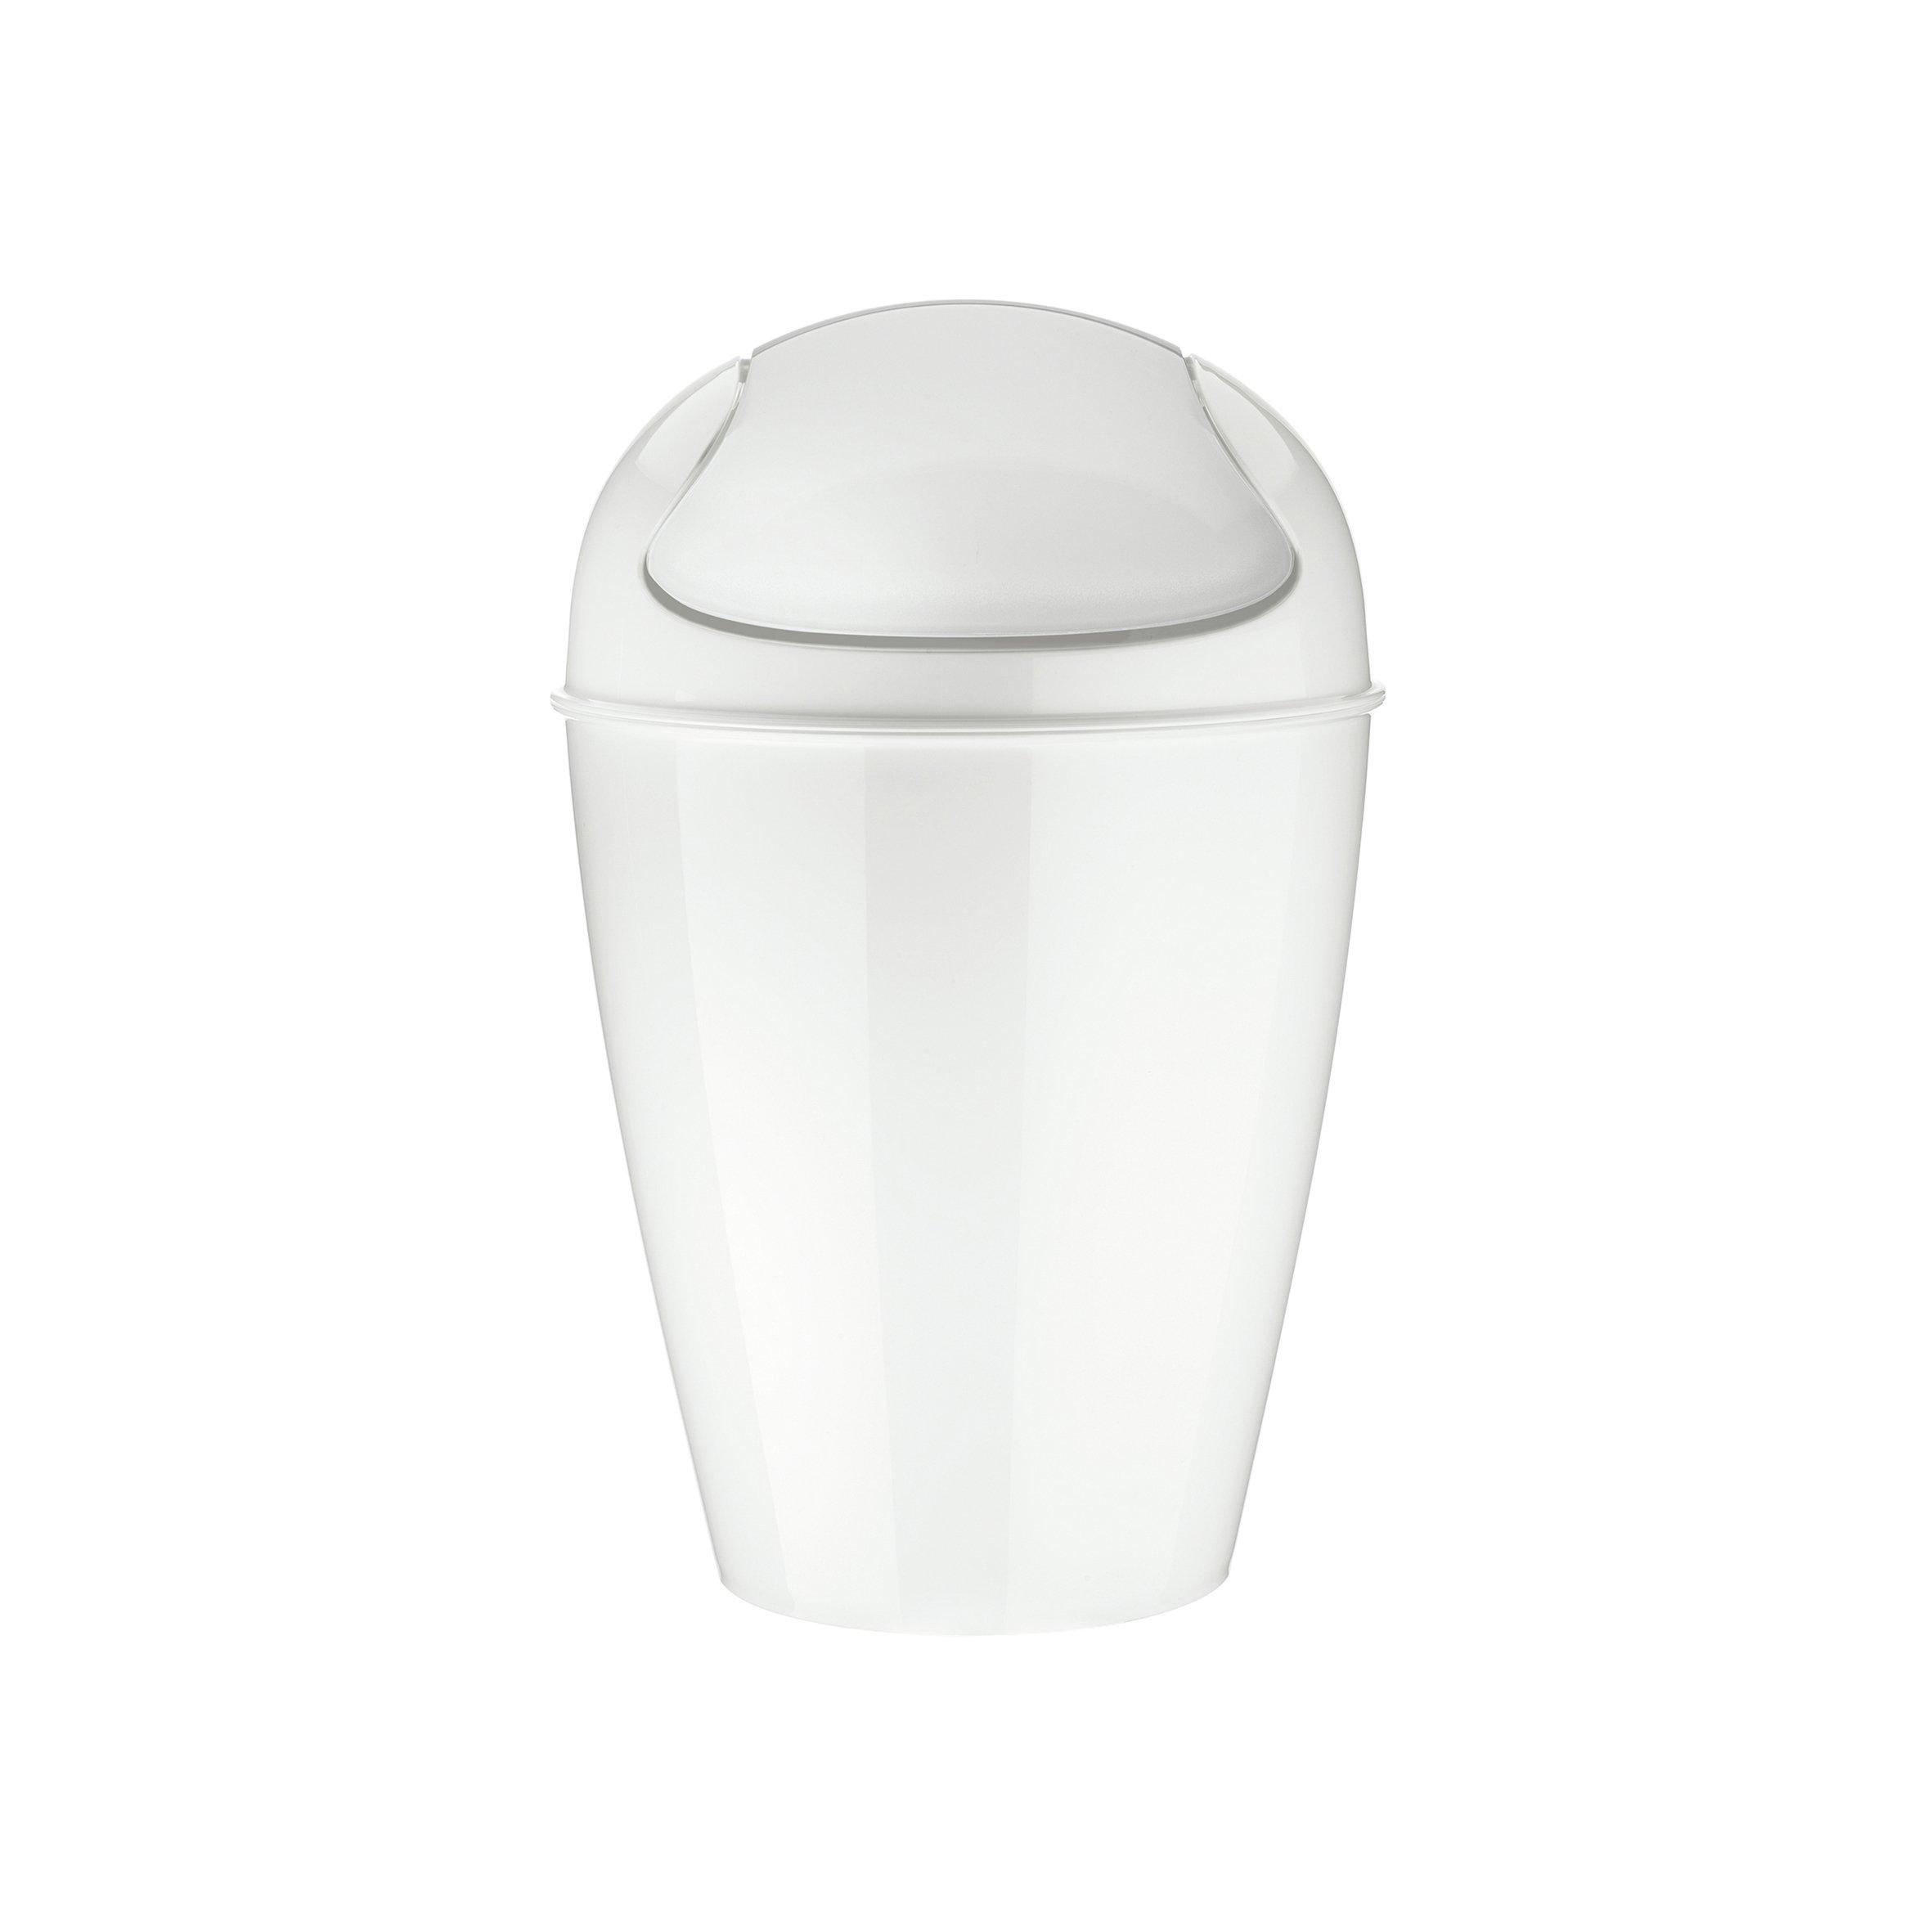 CDM product Koziol 5777525 DEL S Swing-Top 5 L Wastebasket big image